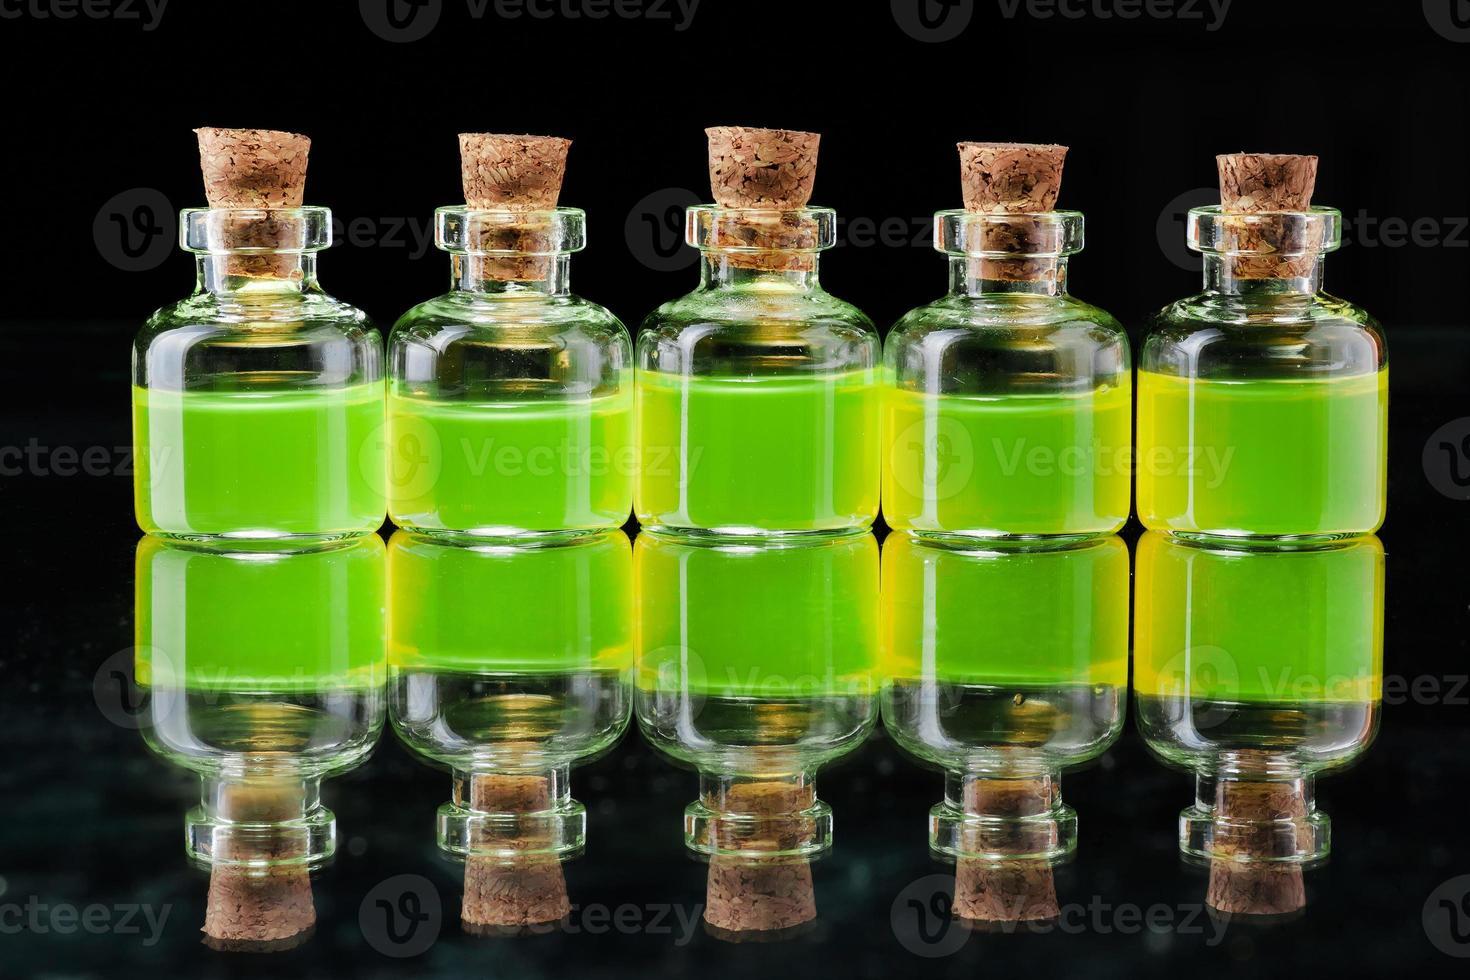 medicijnen flesje foto